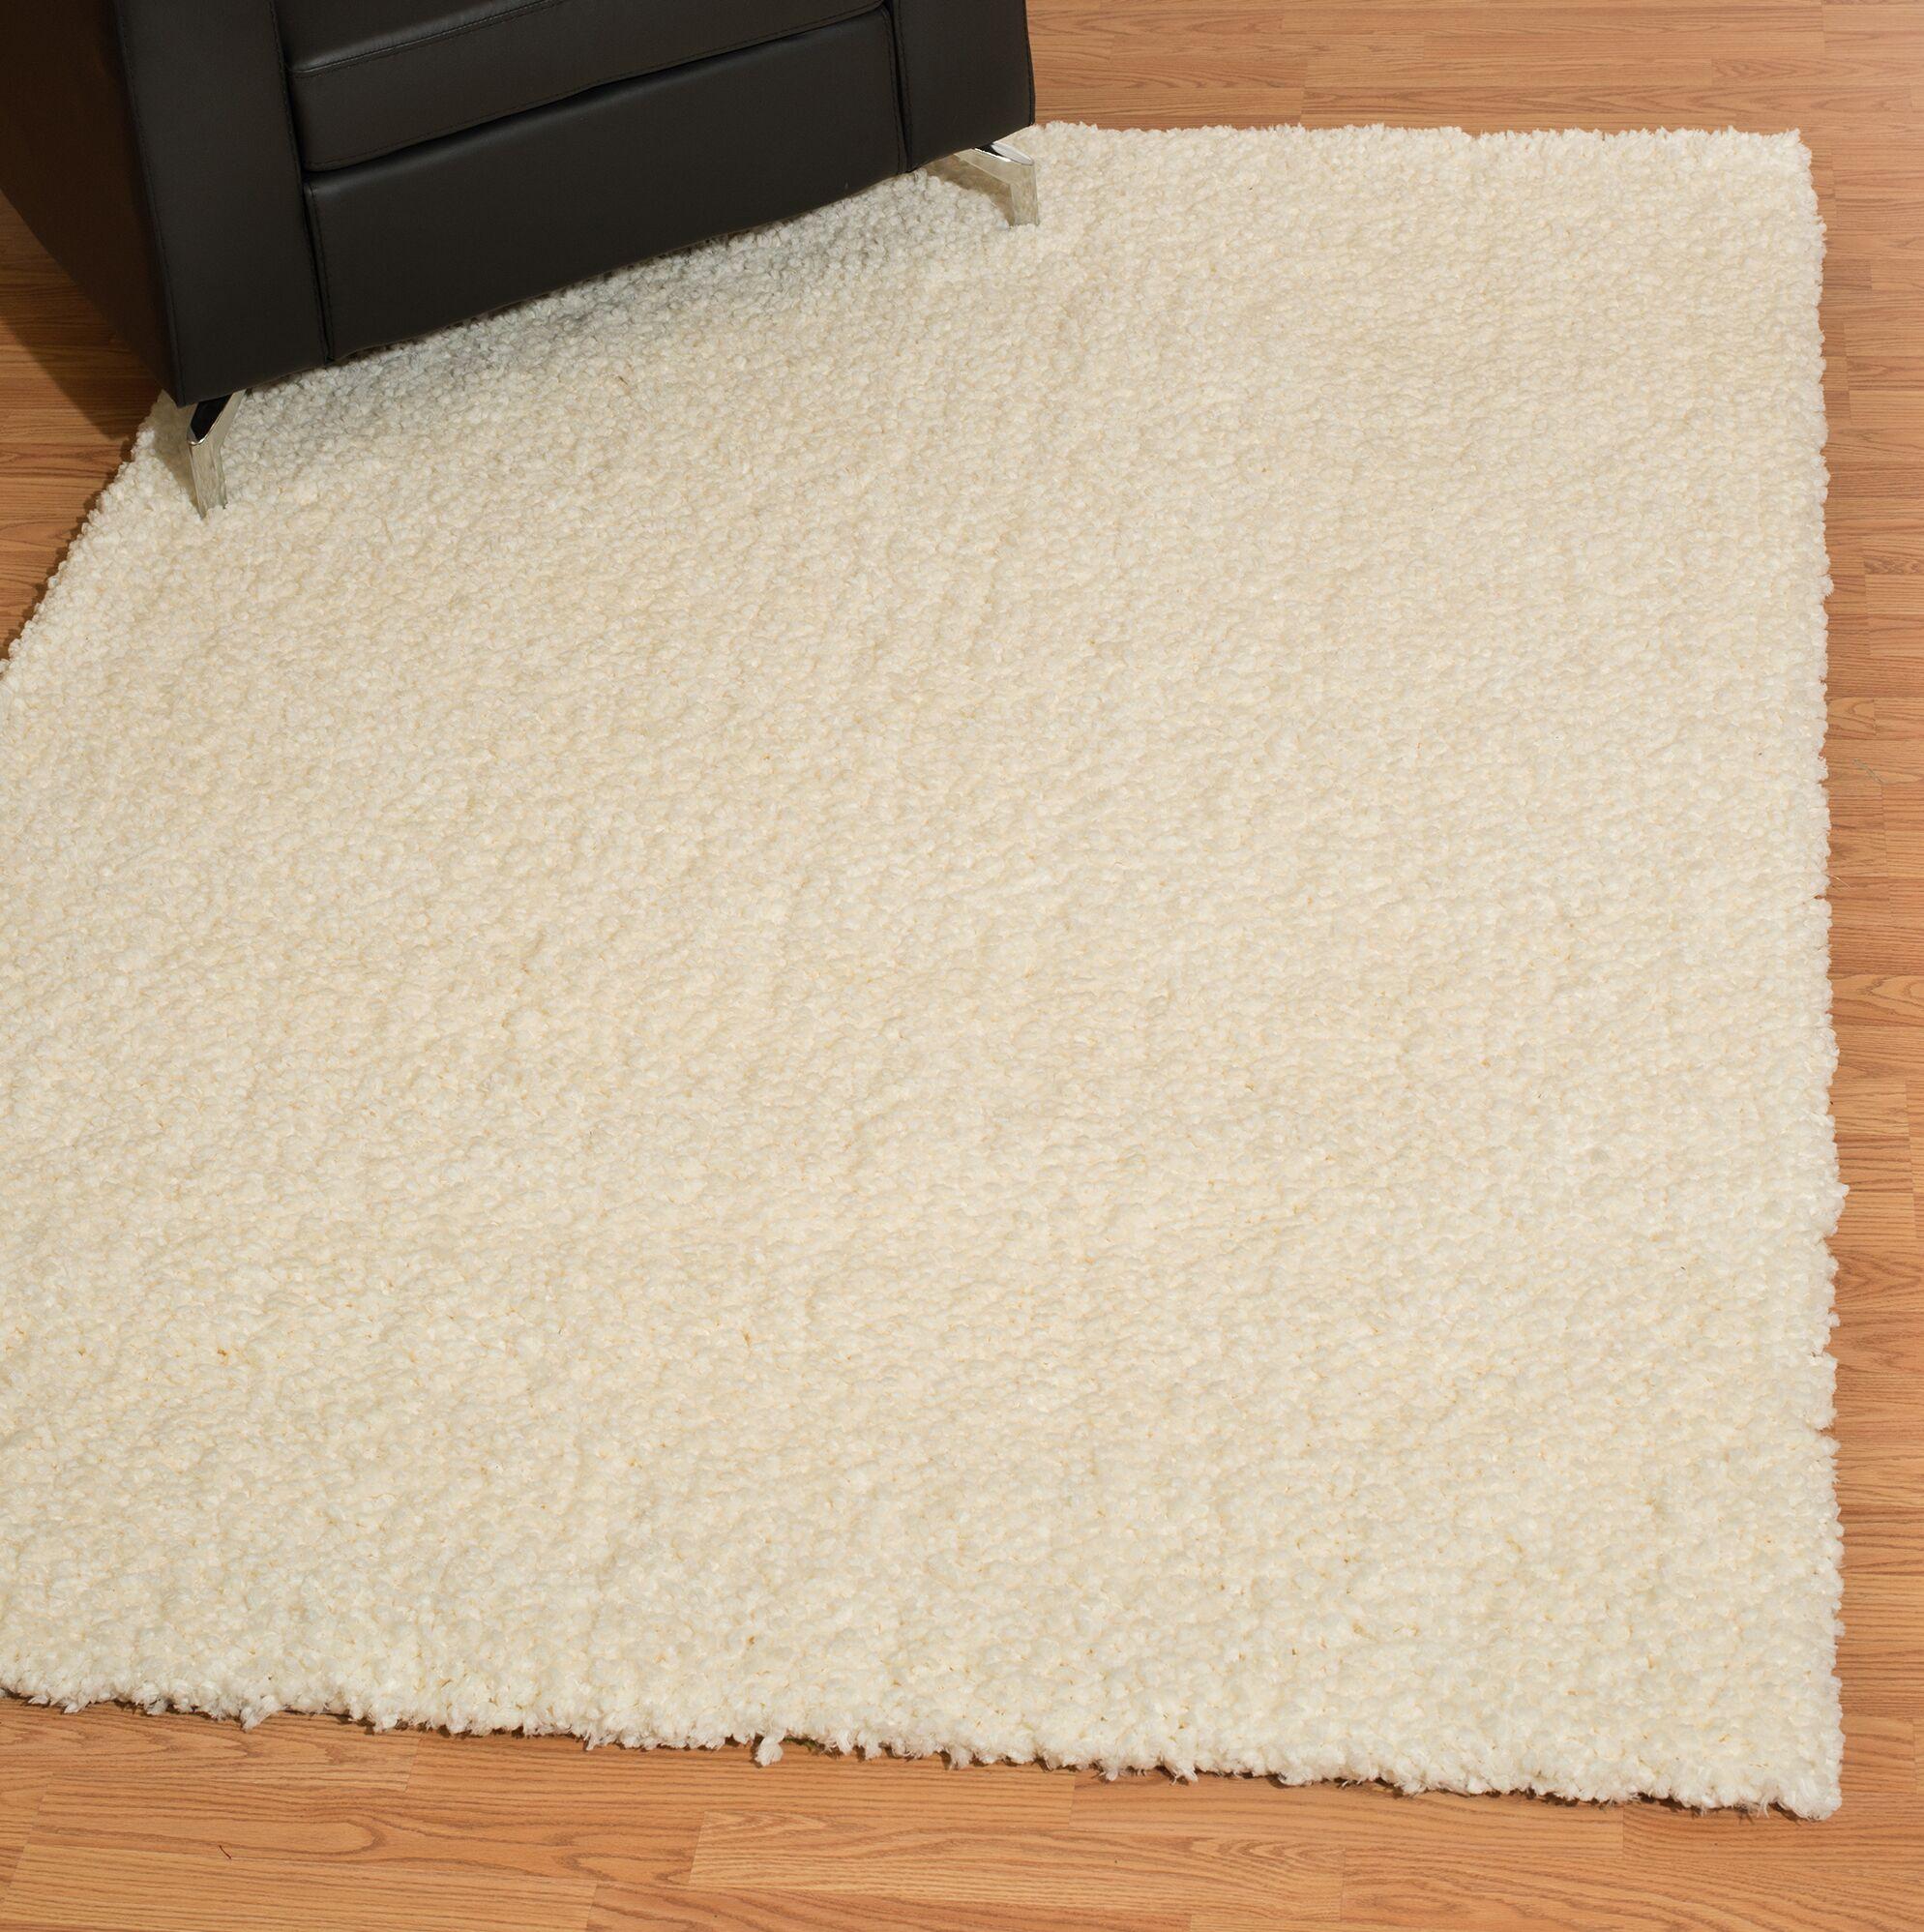 Mullenix Cream Area Rug Rug Size: Rectangle 5'3